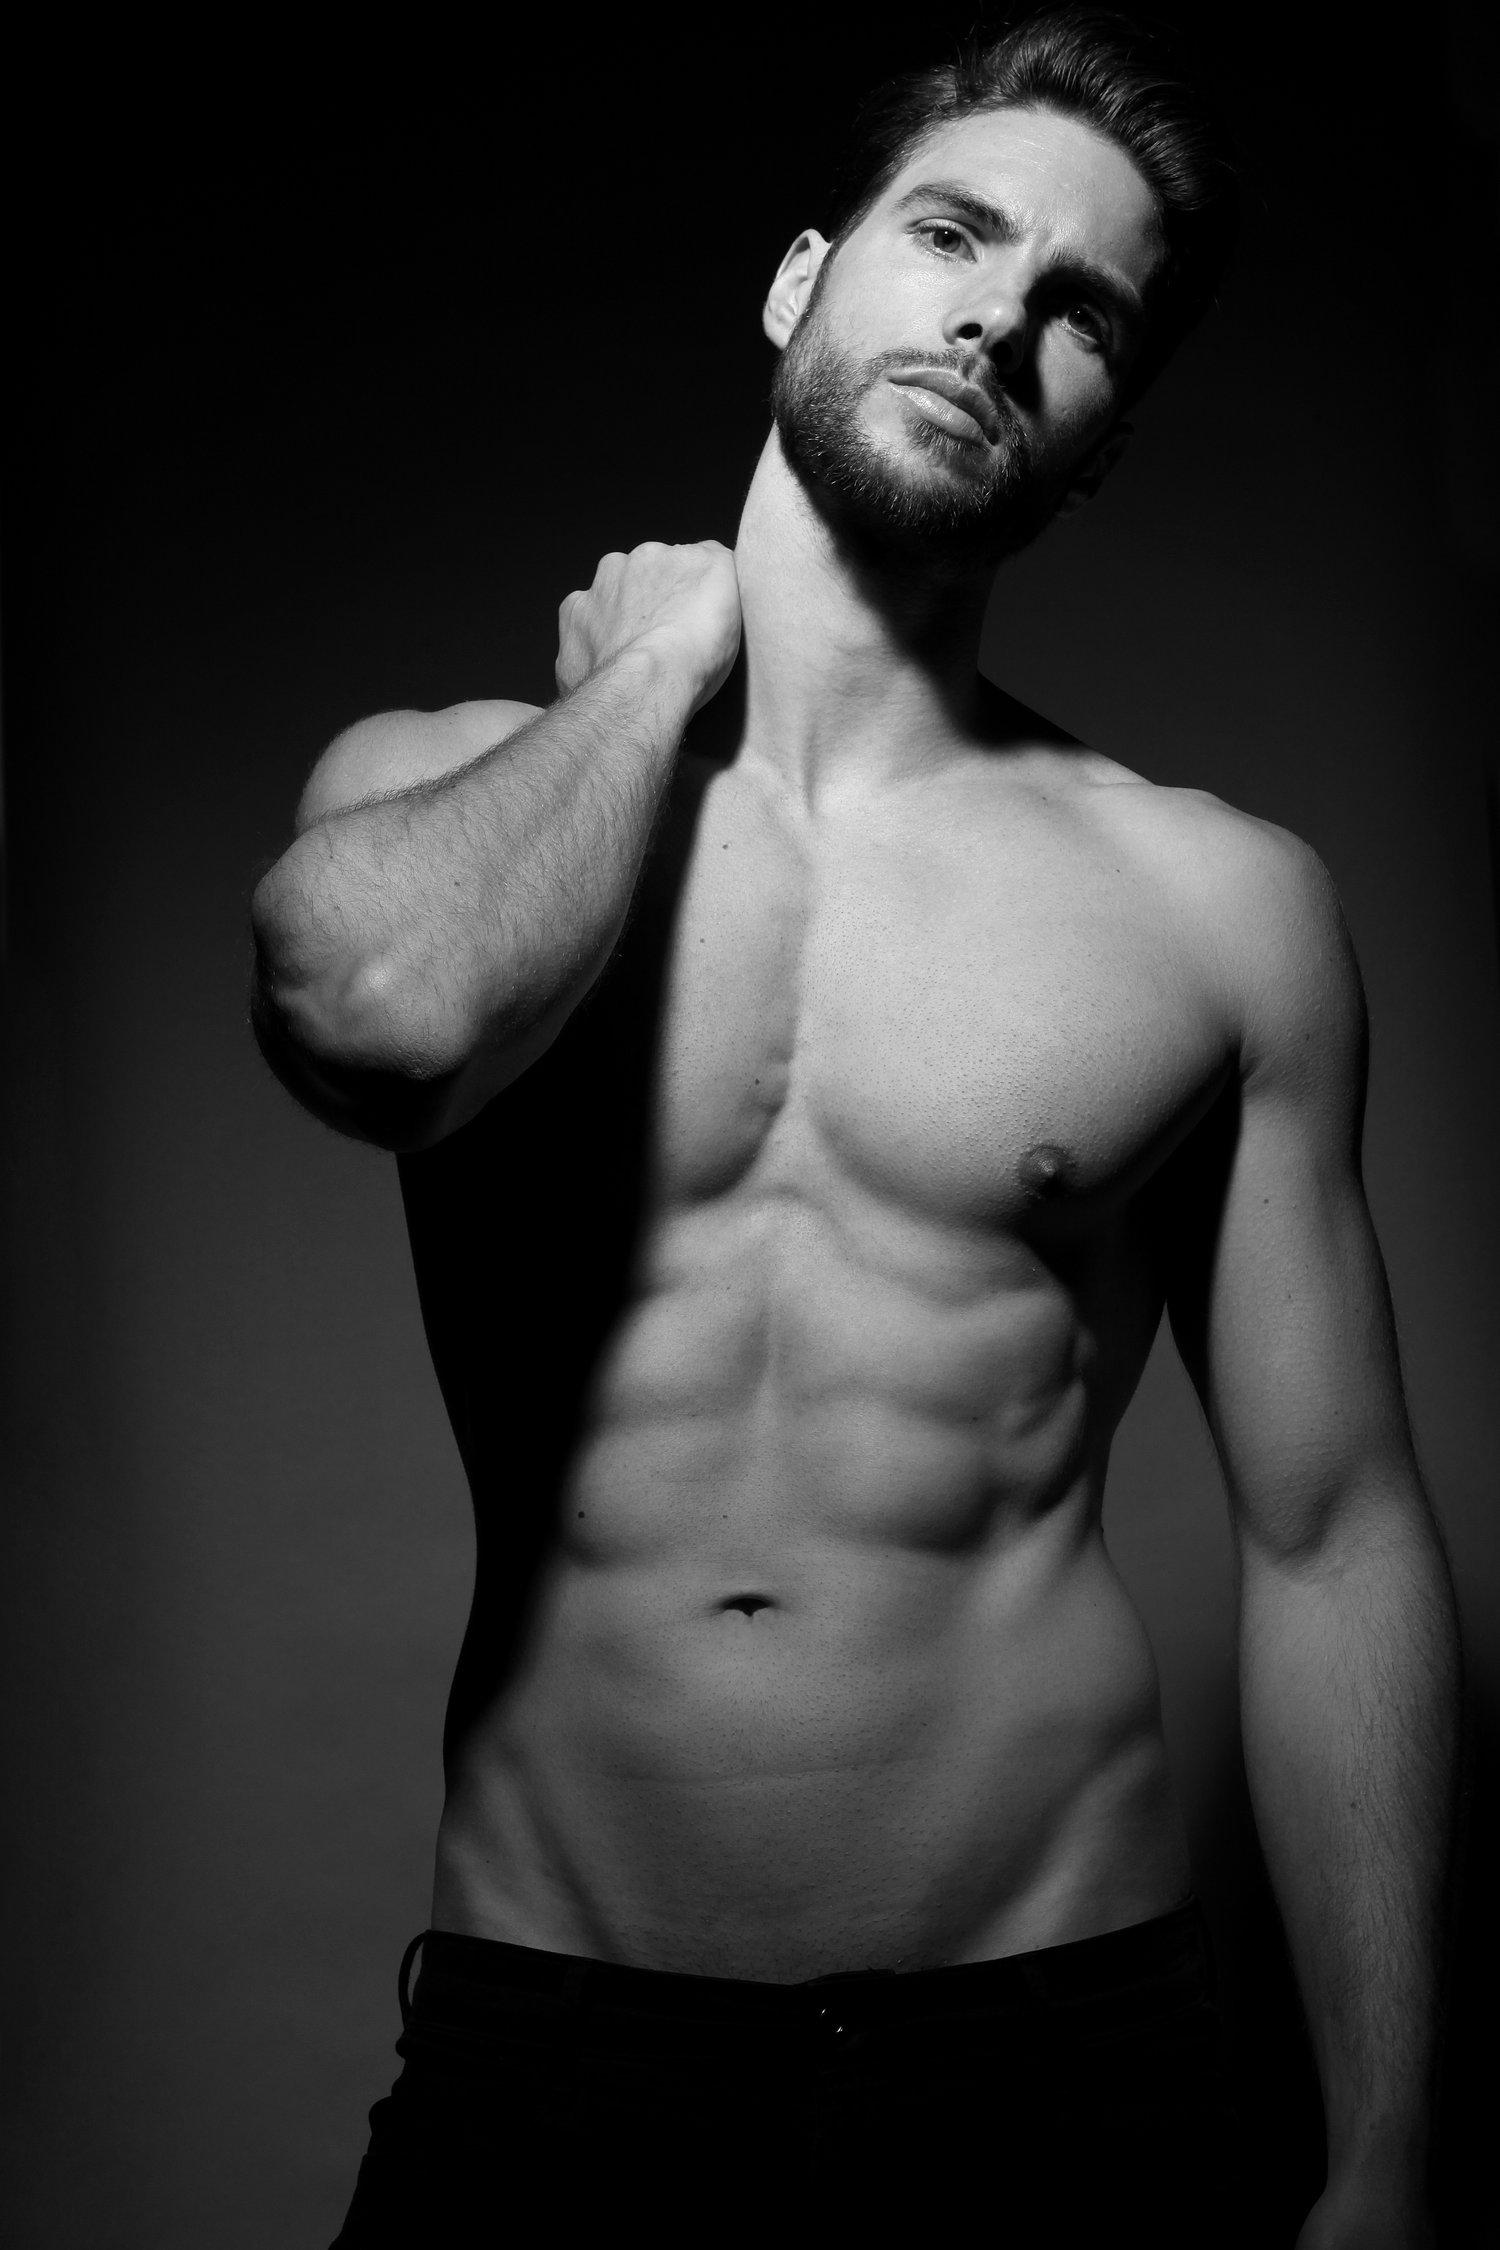 Adon Exclusive: Model Laurent Litenson By Kendra Storm Rae